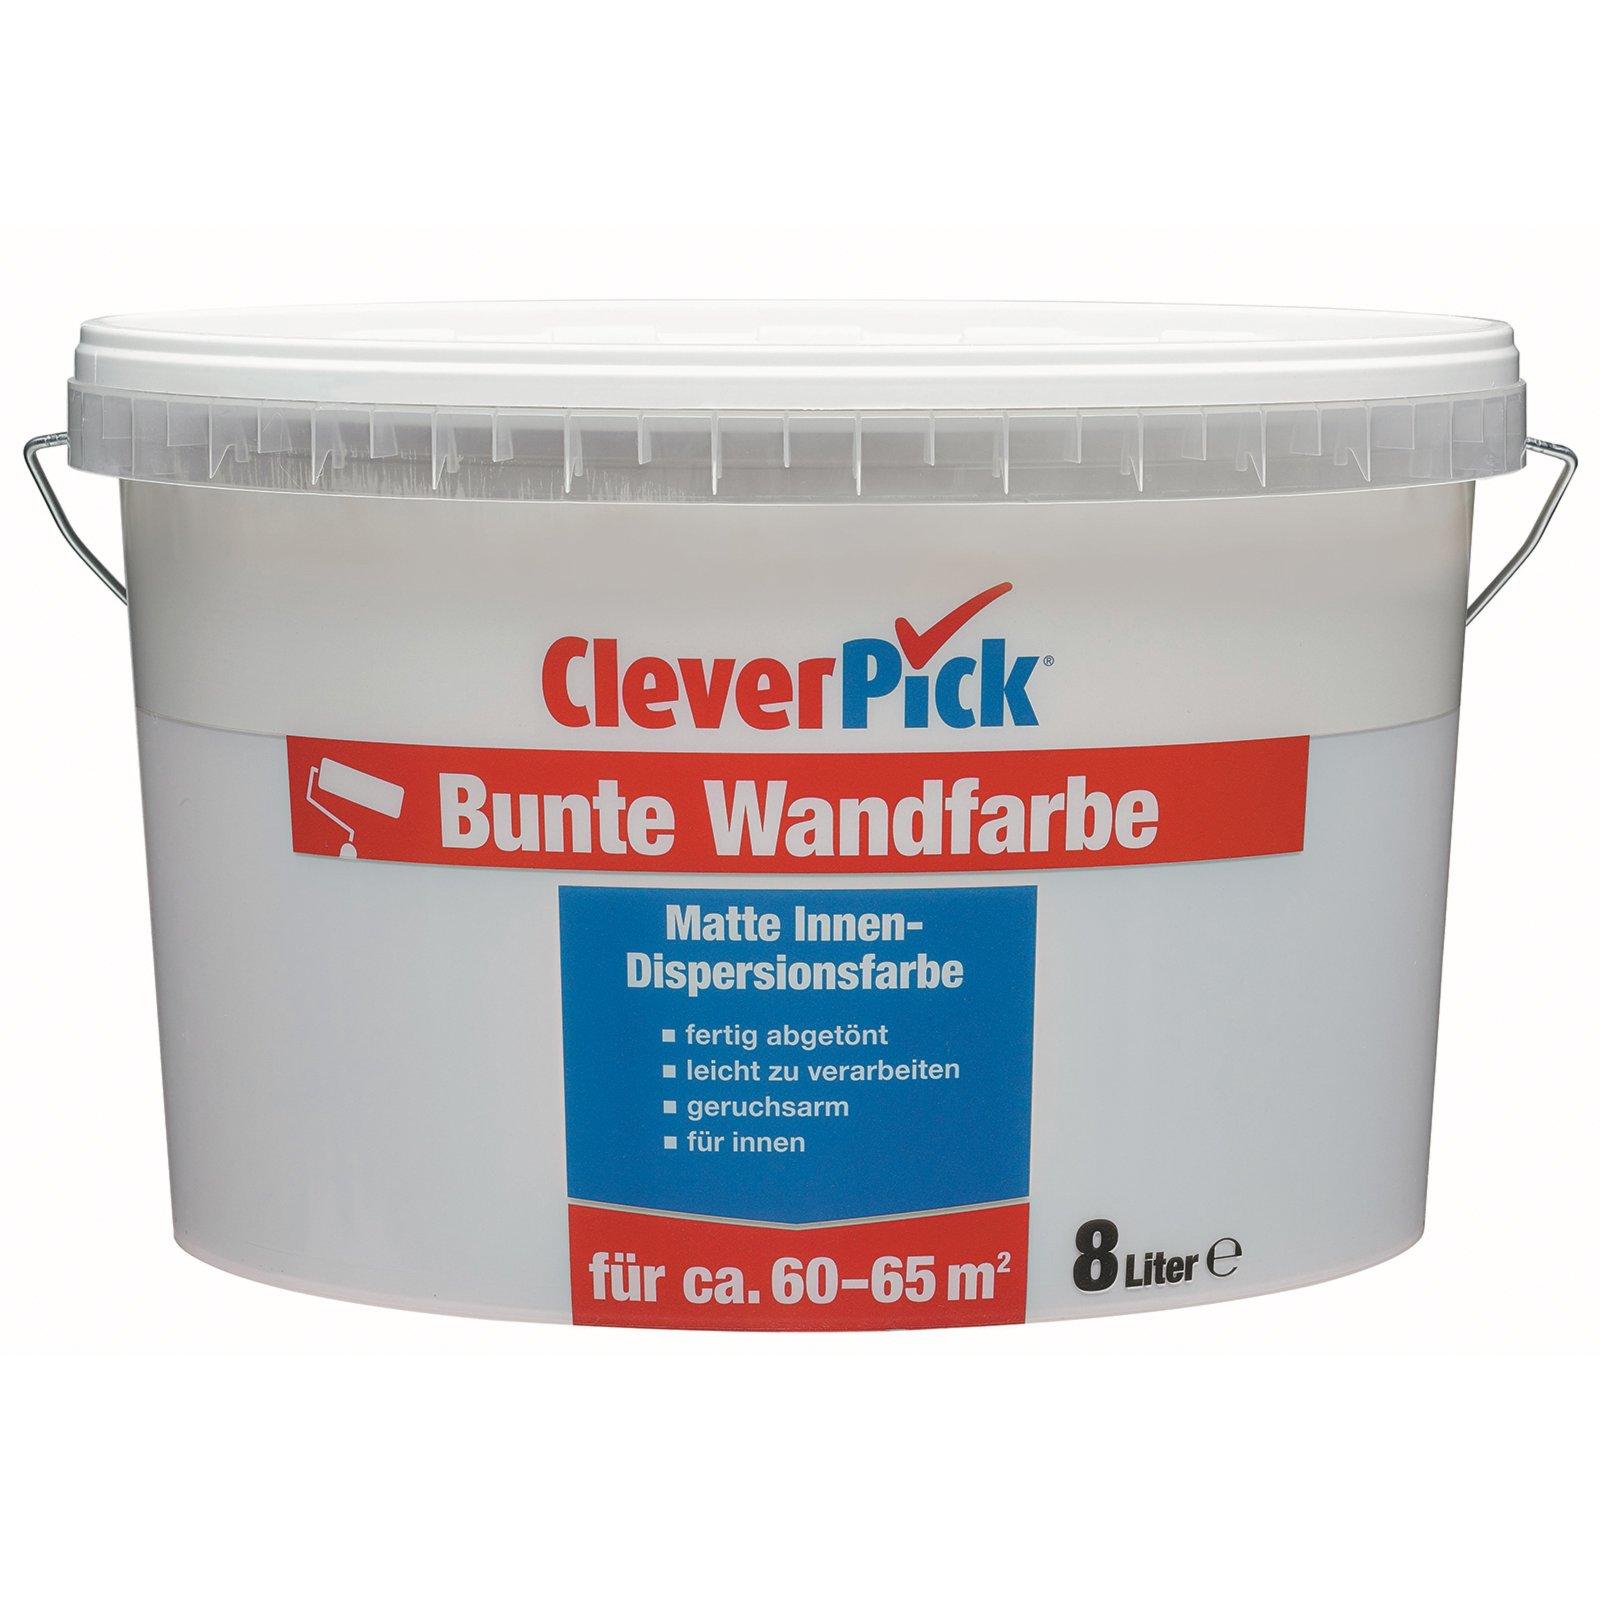 cleverpick bunte wandfarbe fels 8 liter wandfarben. Black Bedroom Furniture Sets. Home Design Ideas